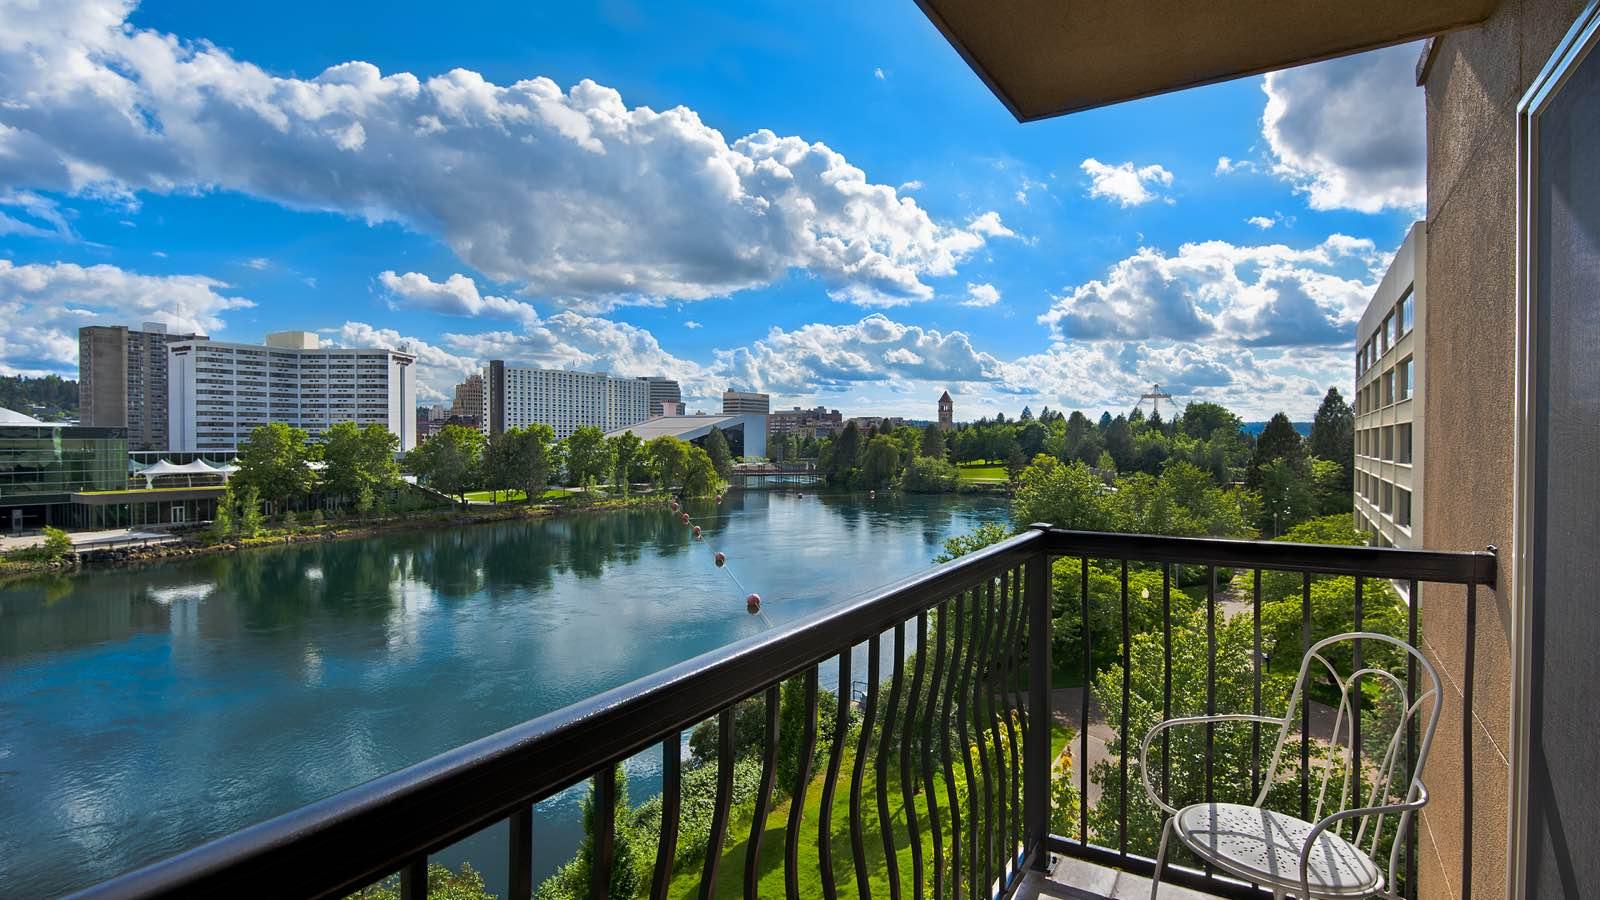 Spokane Home Idea Show Spokane Washington Oxford Suites